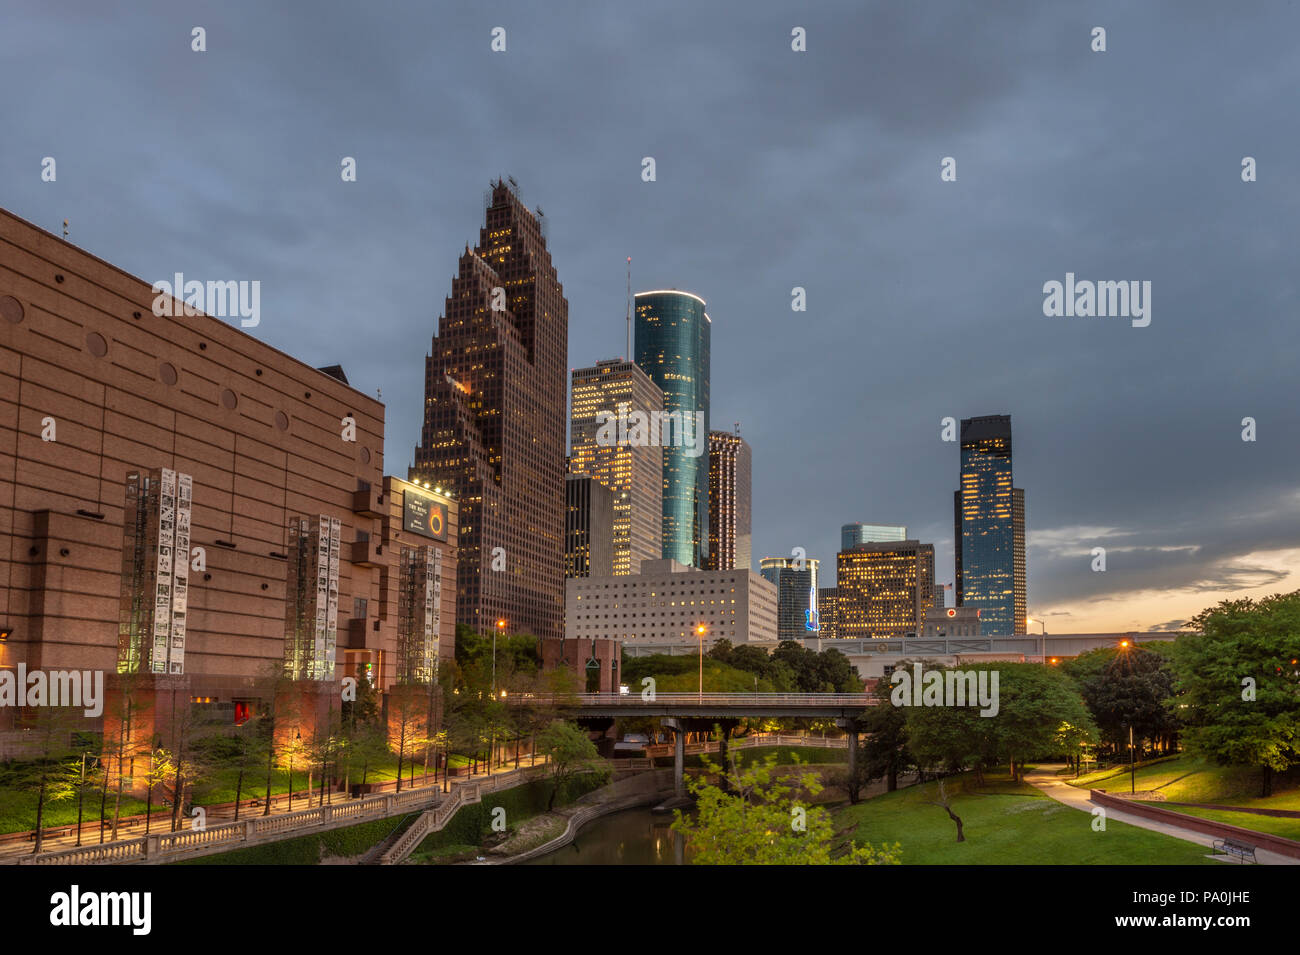 Buffalo Bayou in downtown Houston at night. - Stock Image